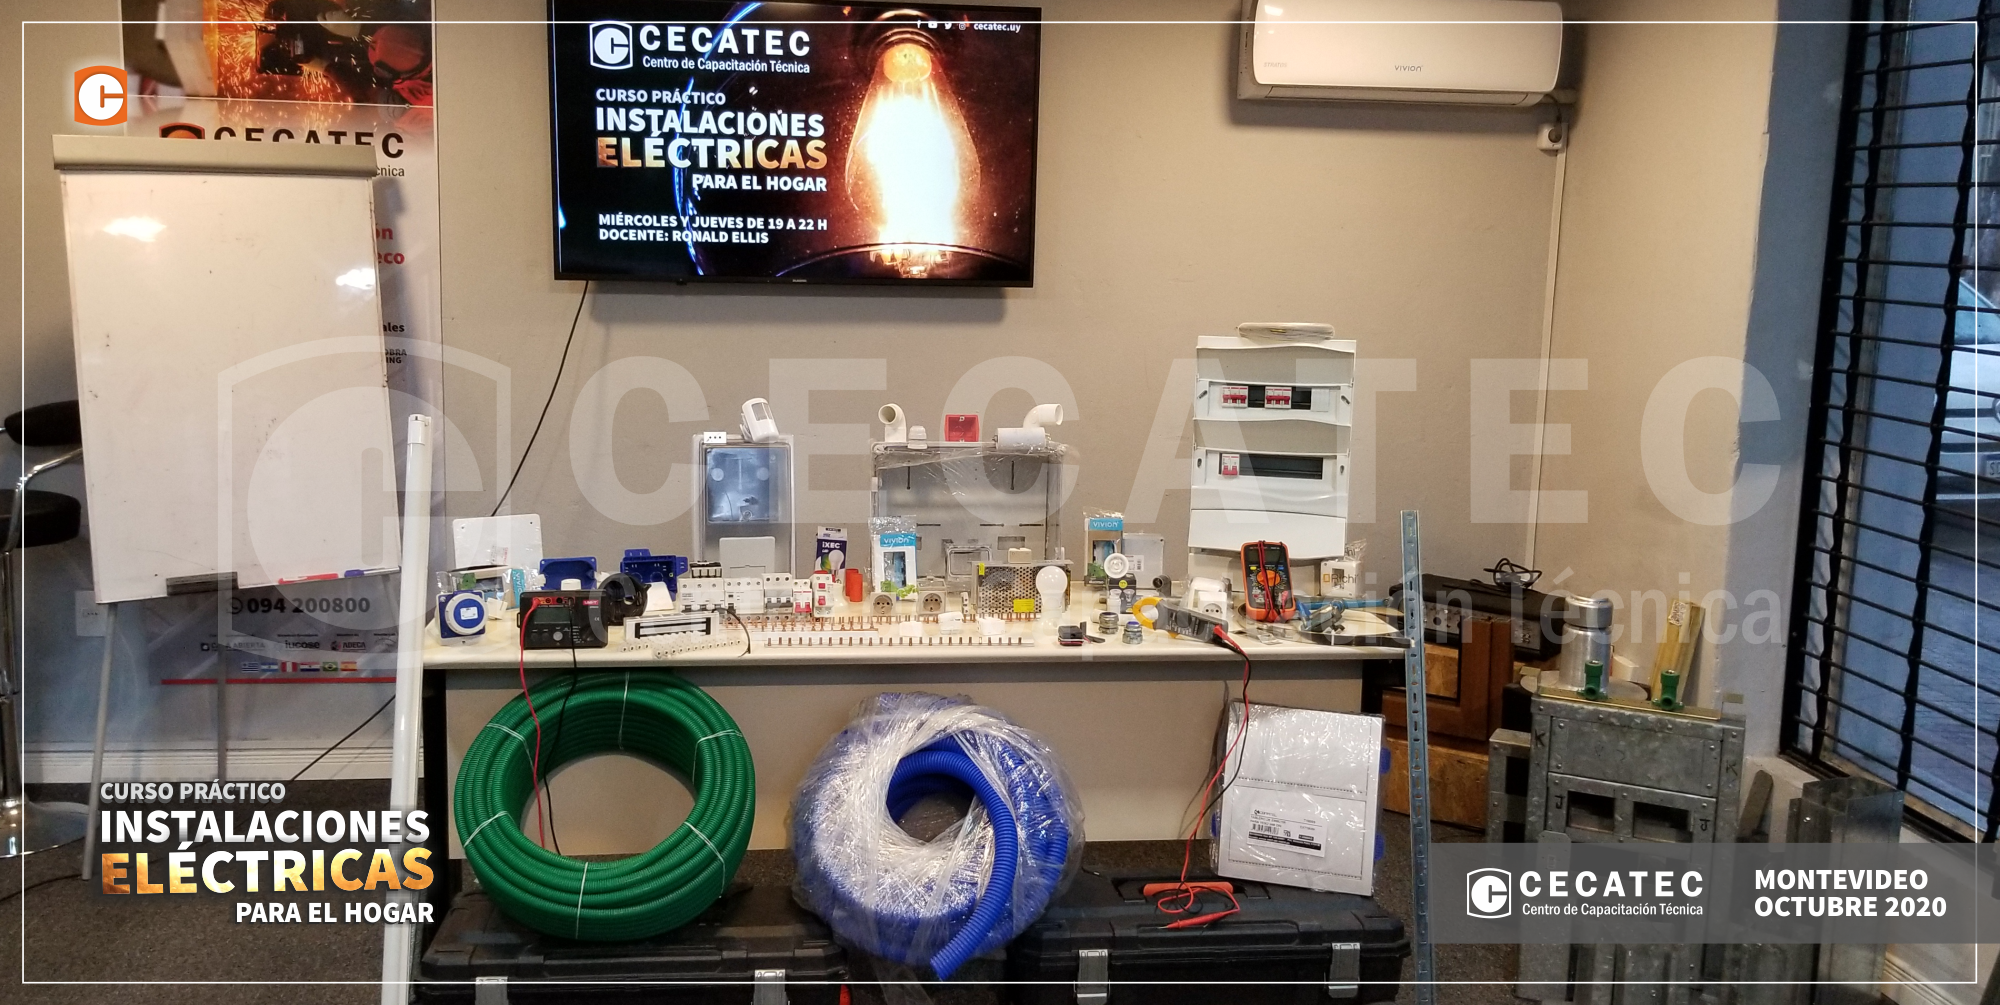 Electrica-2020-10-29-04